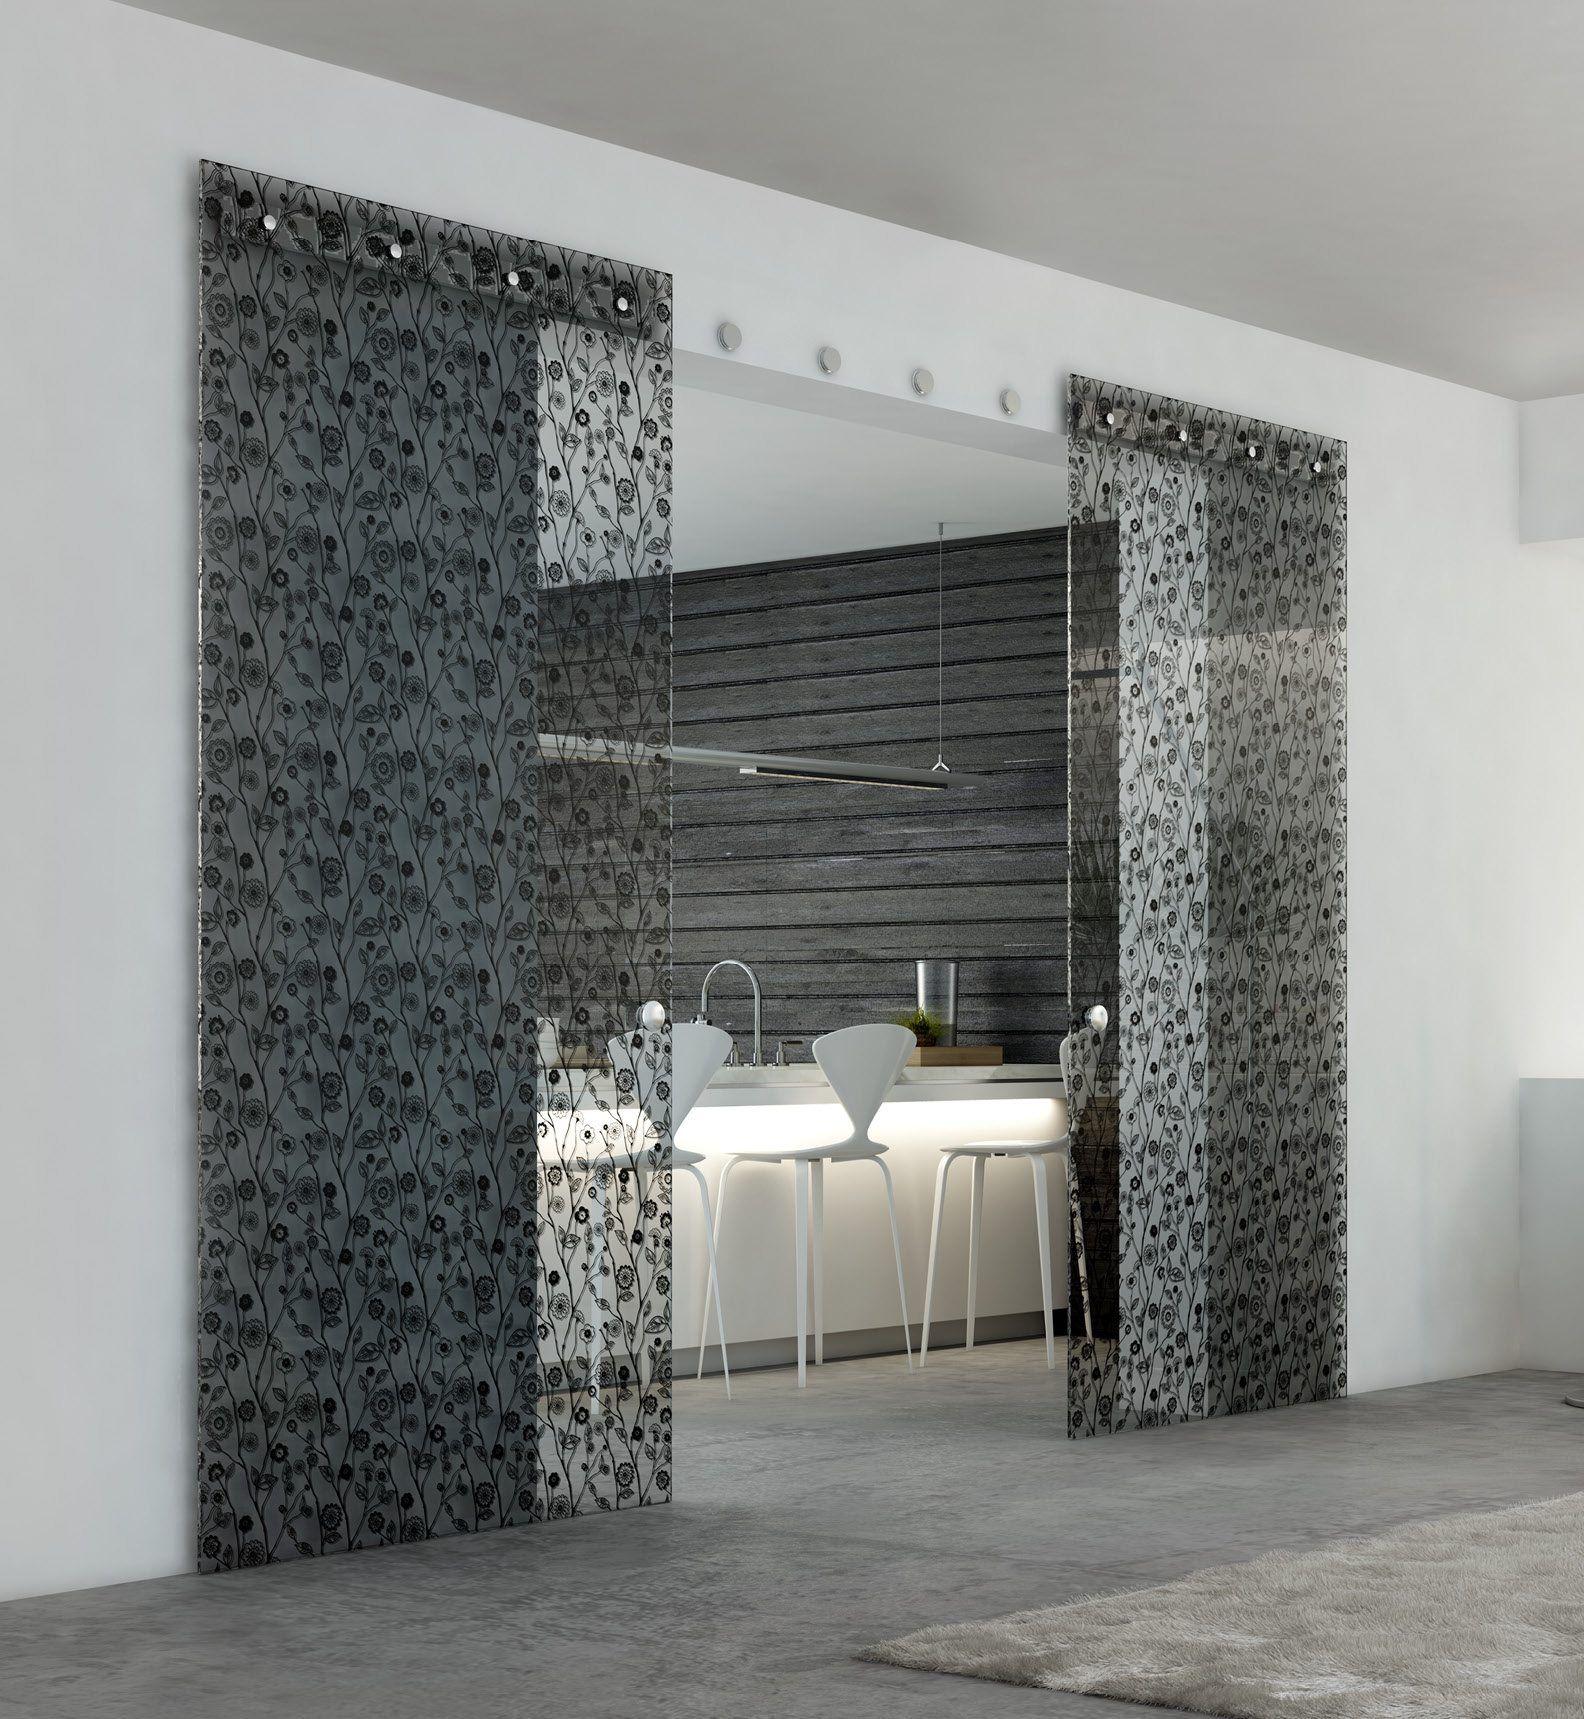 Sliding Door, glamour design, glass, interior design | Design ...